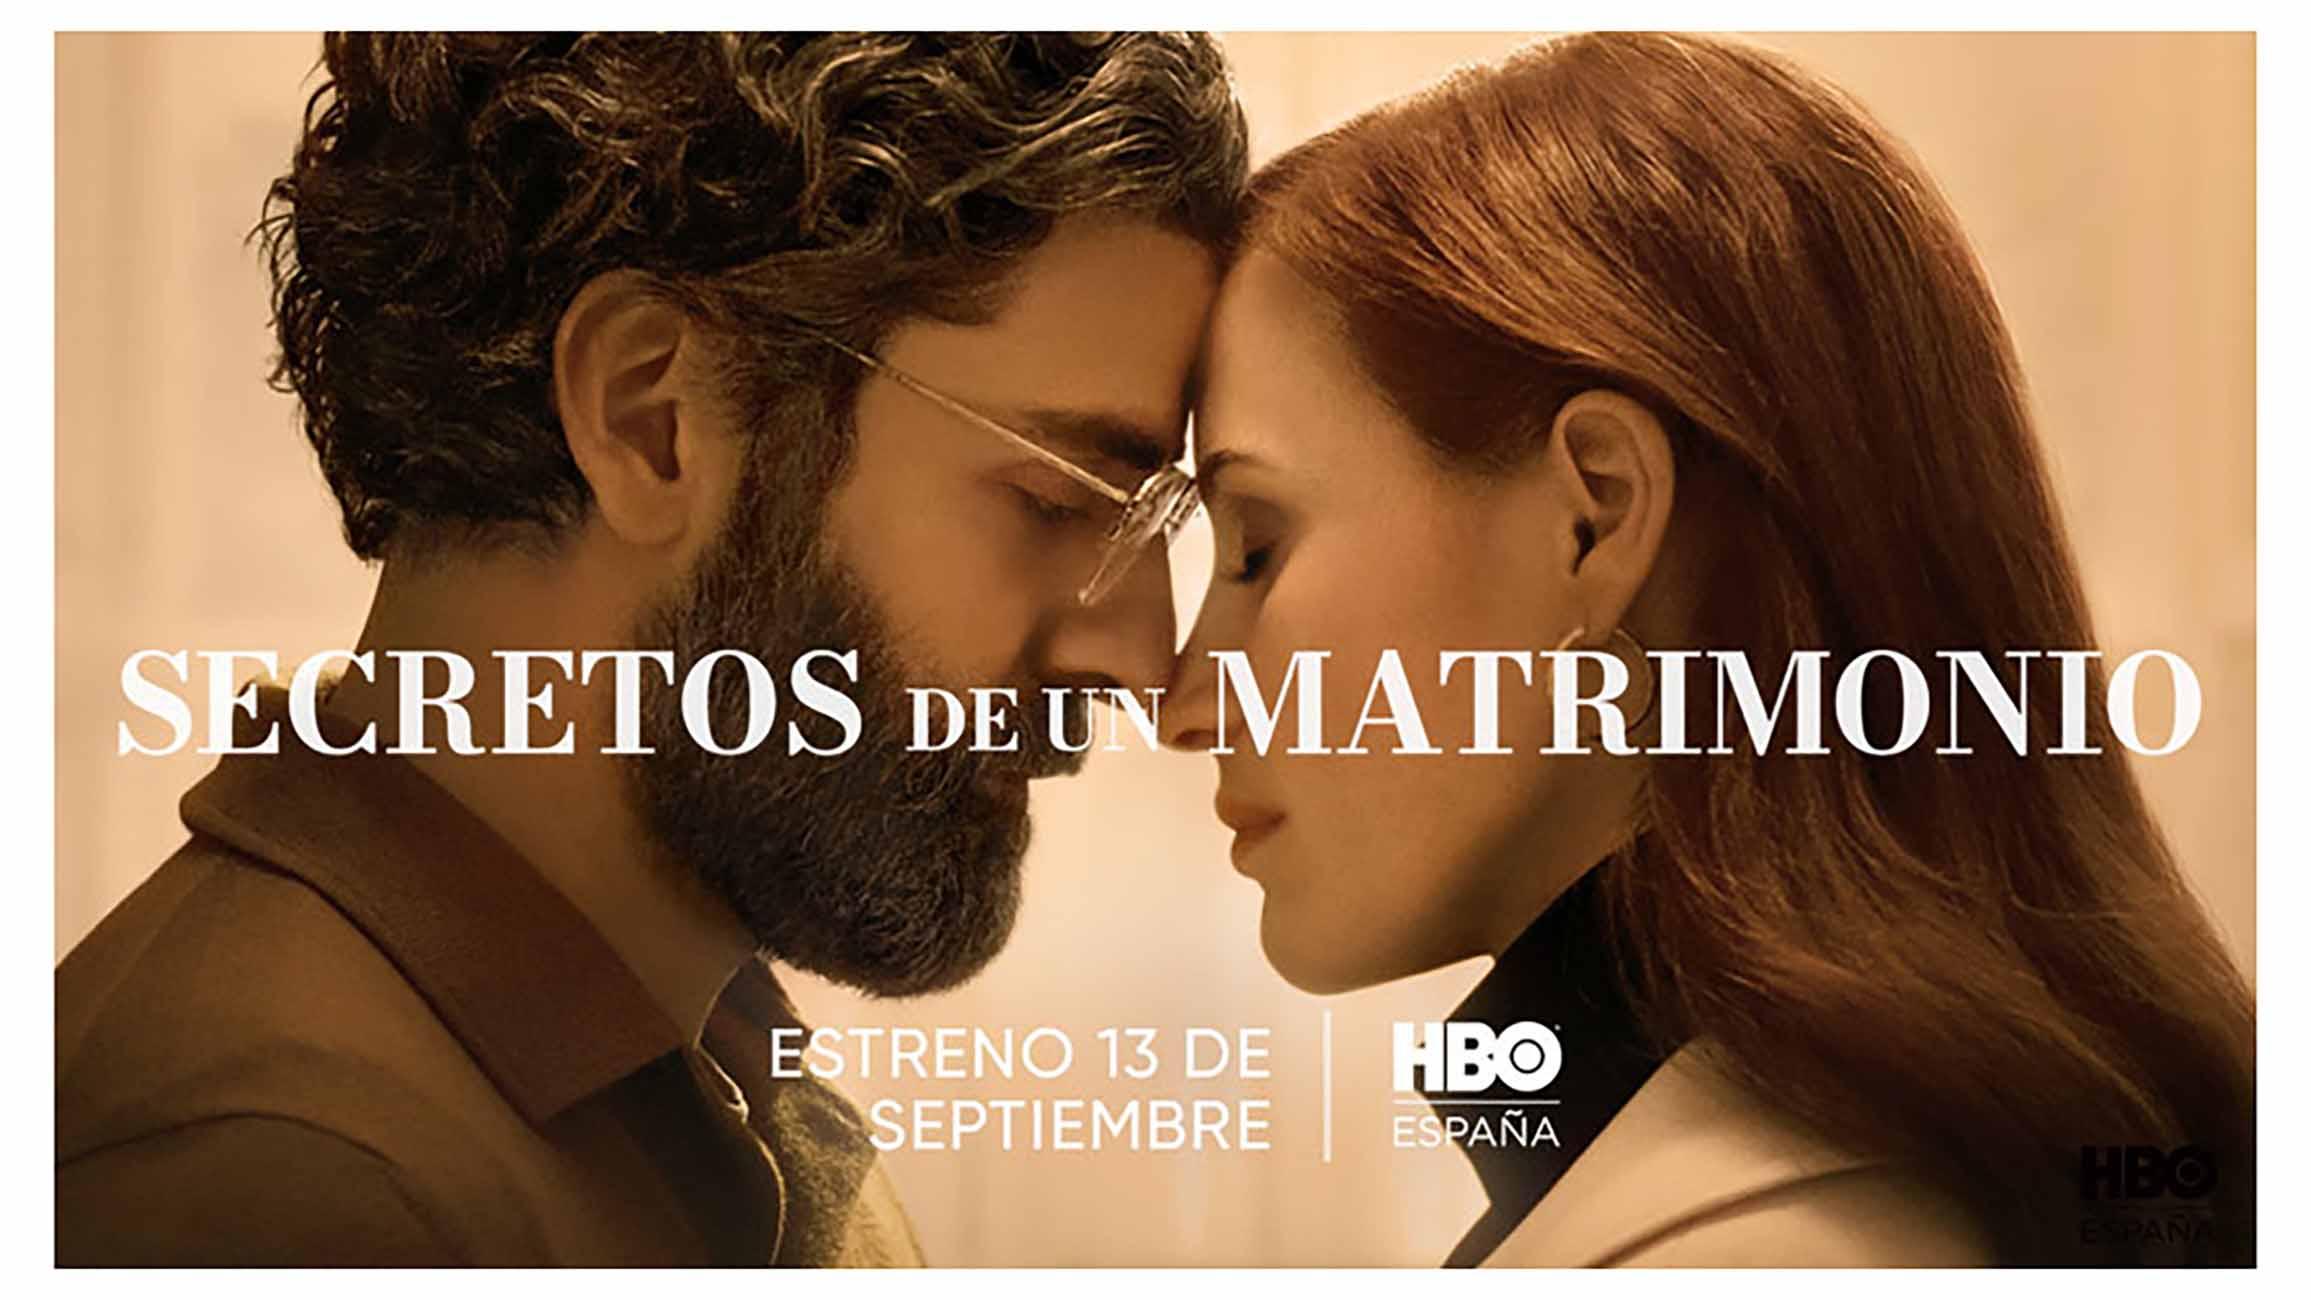 Crítica: 'Secretos de un matrimonio'. Con Jessica Chastain y Oscar Isaac